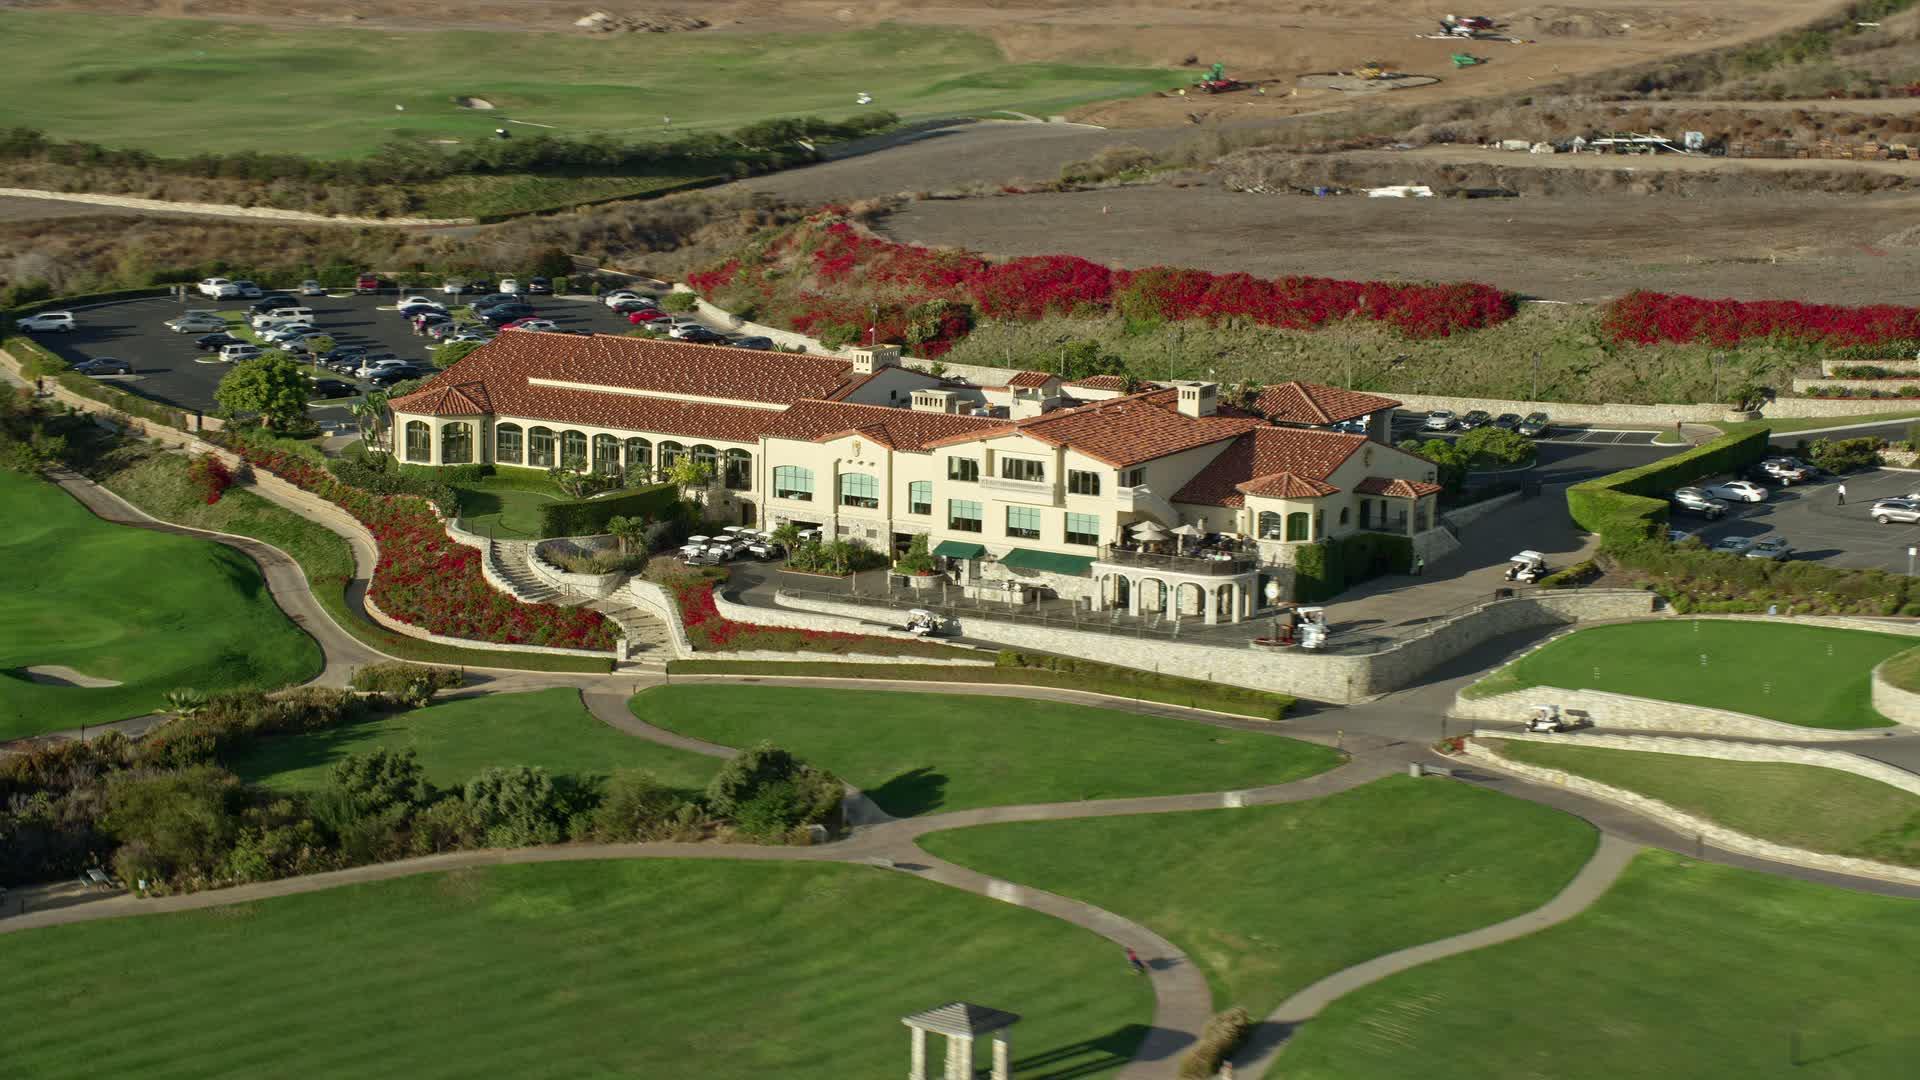 8K stock footage aerial video of Trump National Golf Club ...